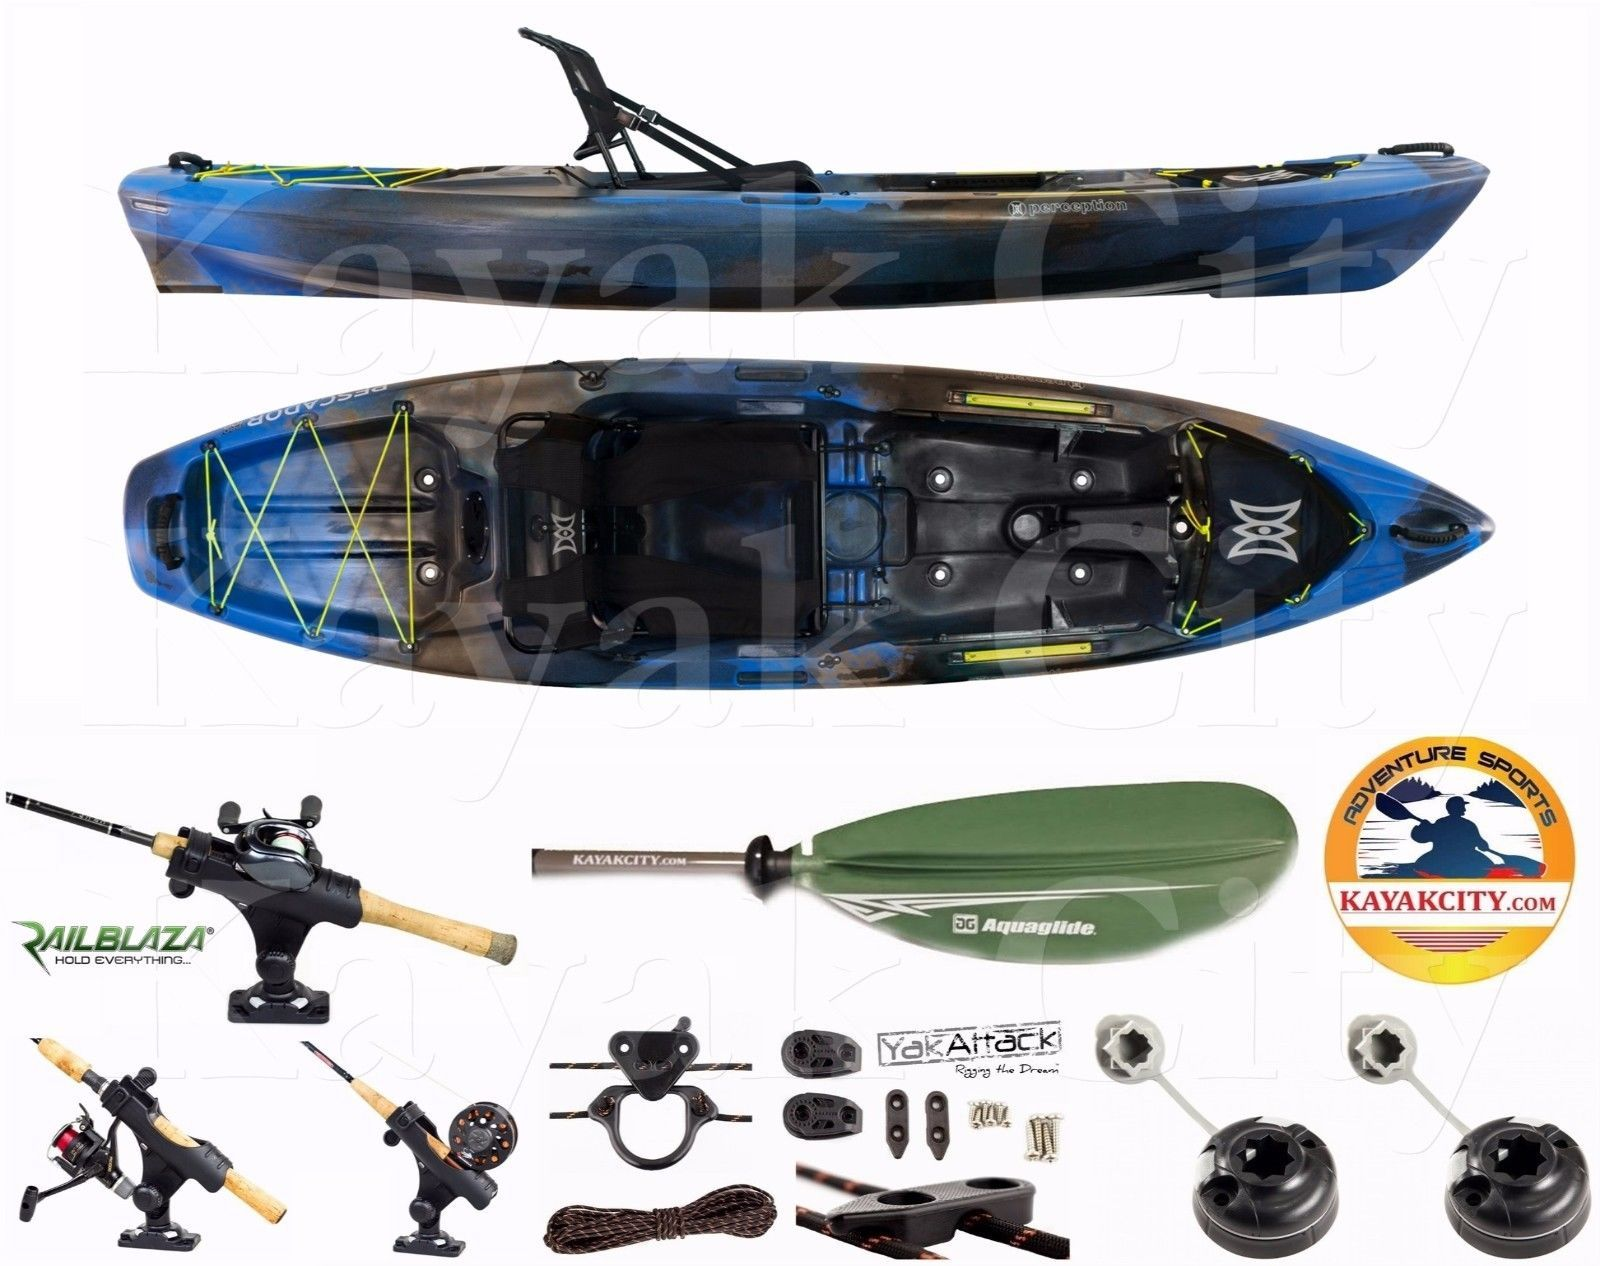 Kayaks 36122 Perception Pescador Pro 10.0 Kayak Sport